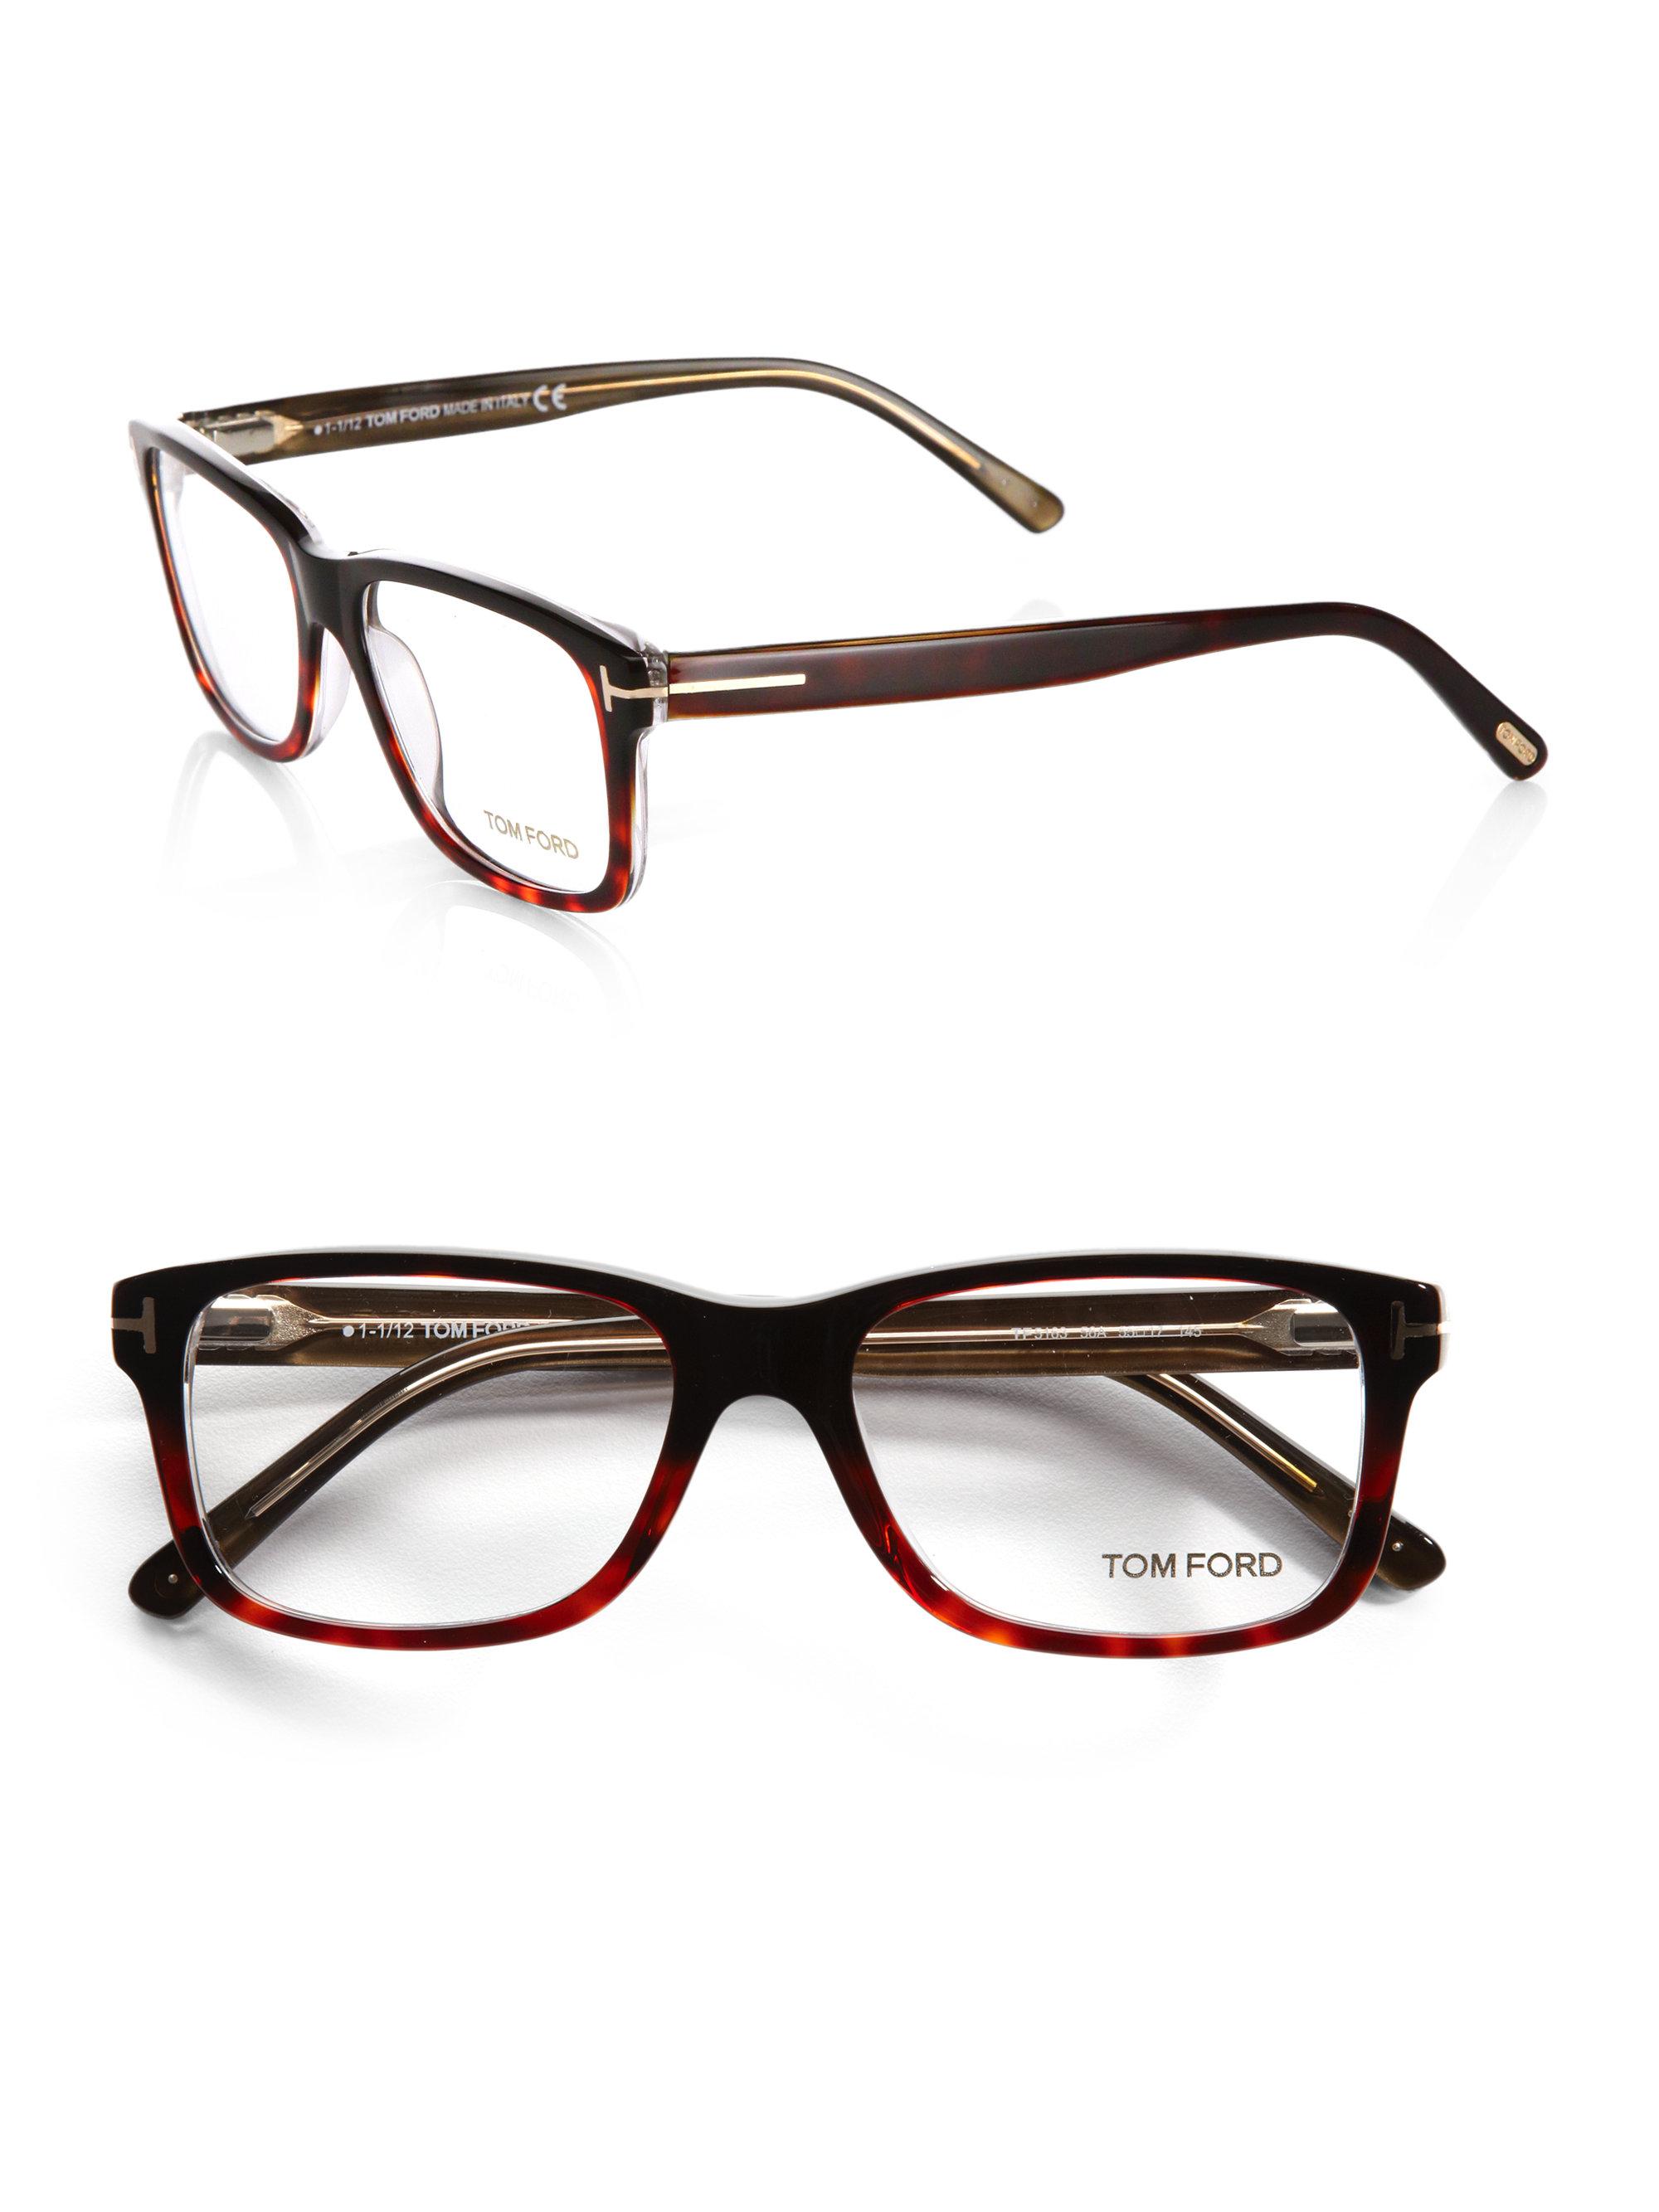 de2ba9c7b15c tom ford prescription sunglasses